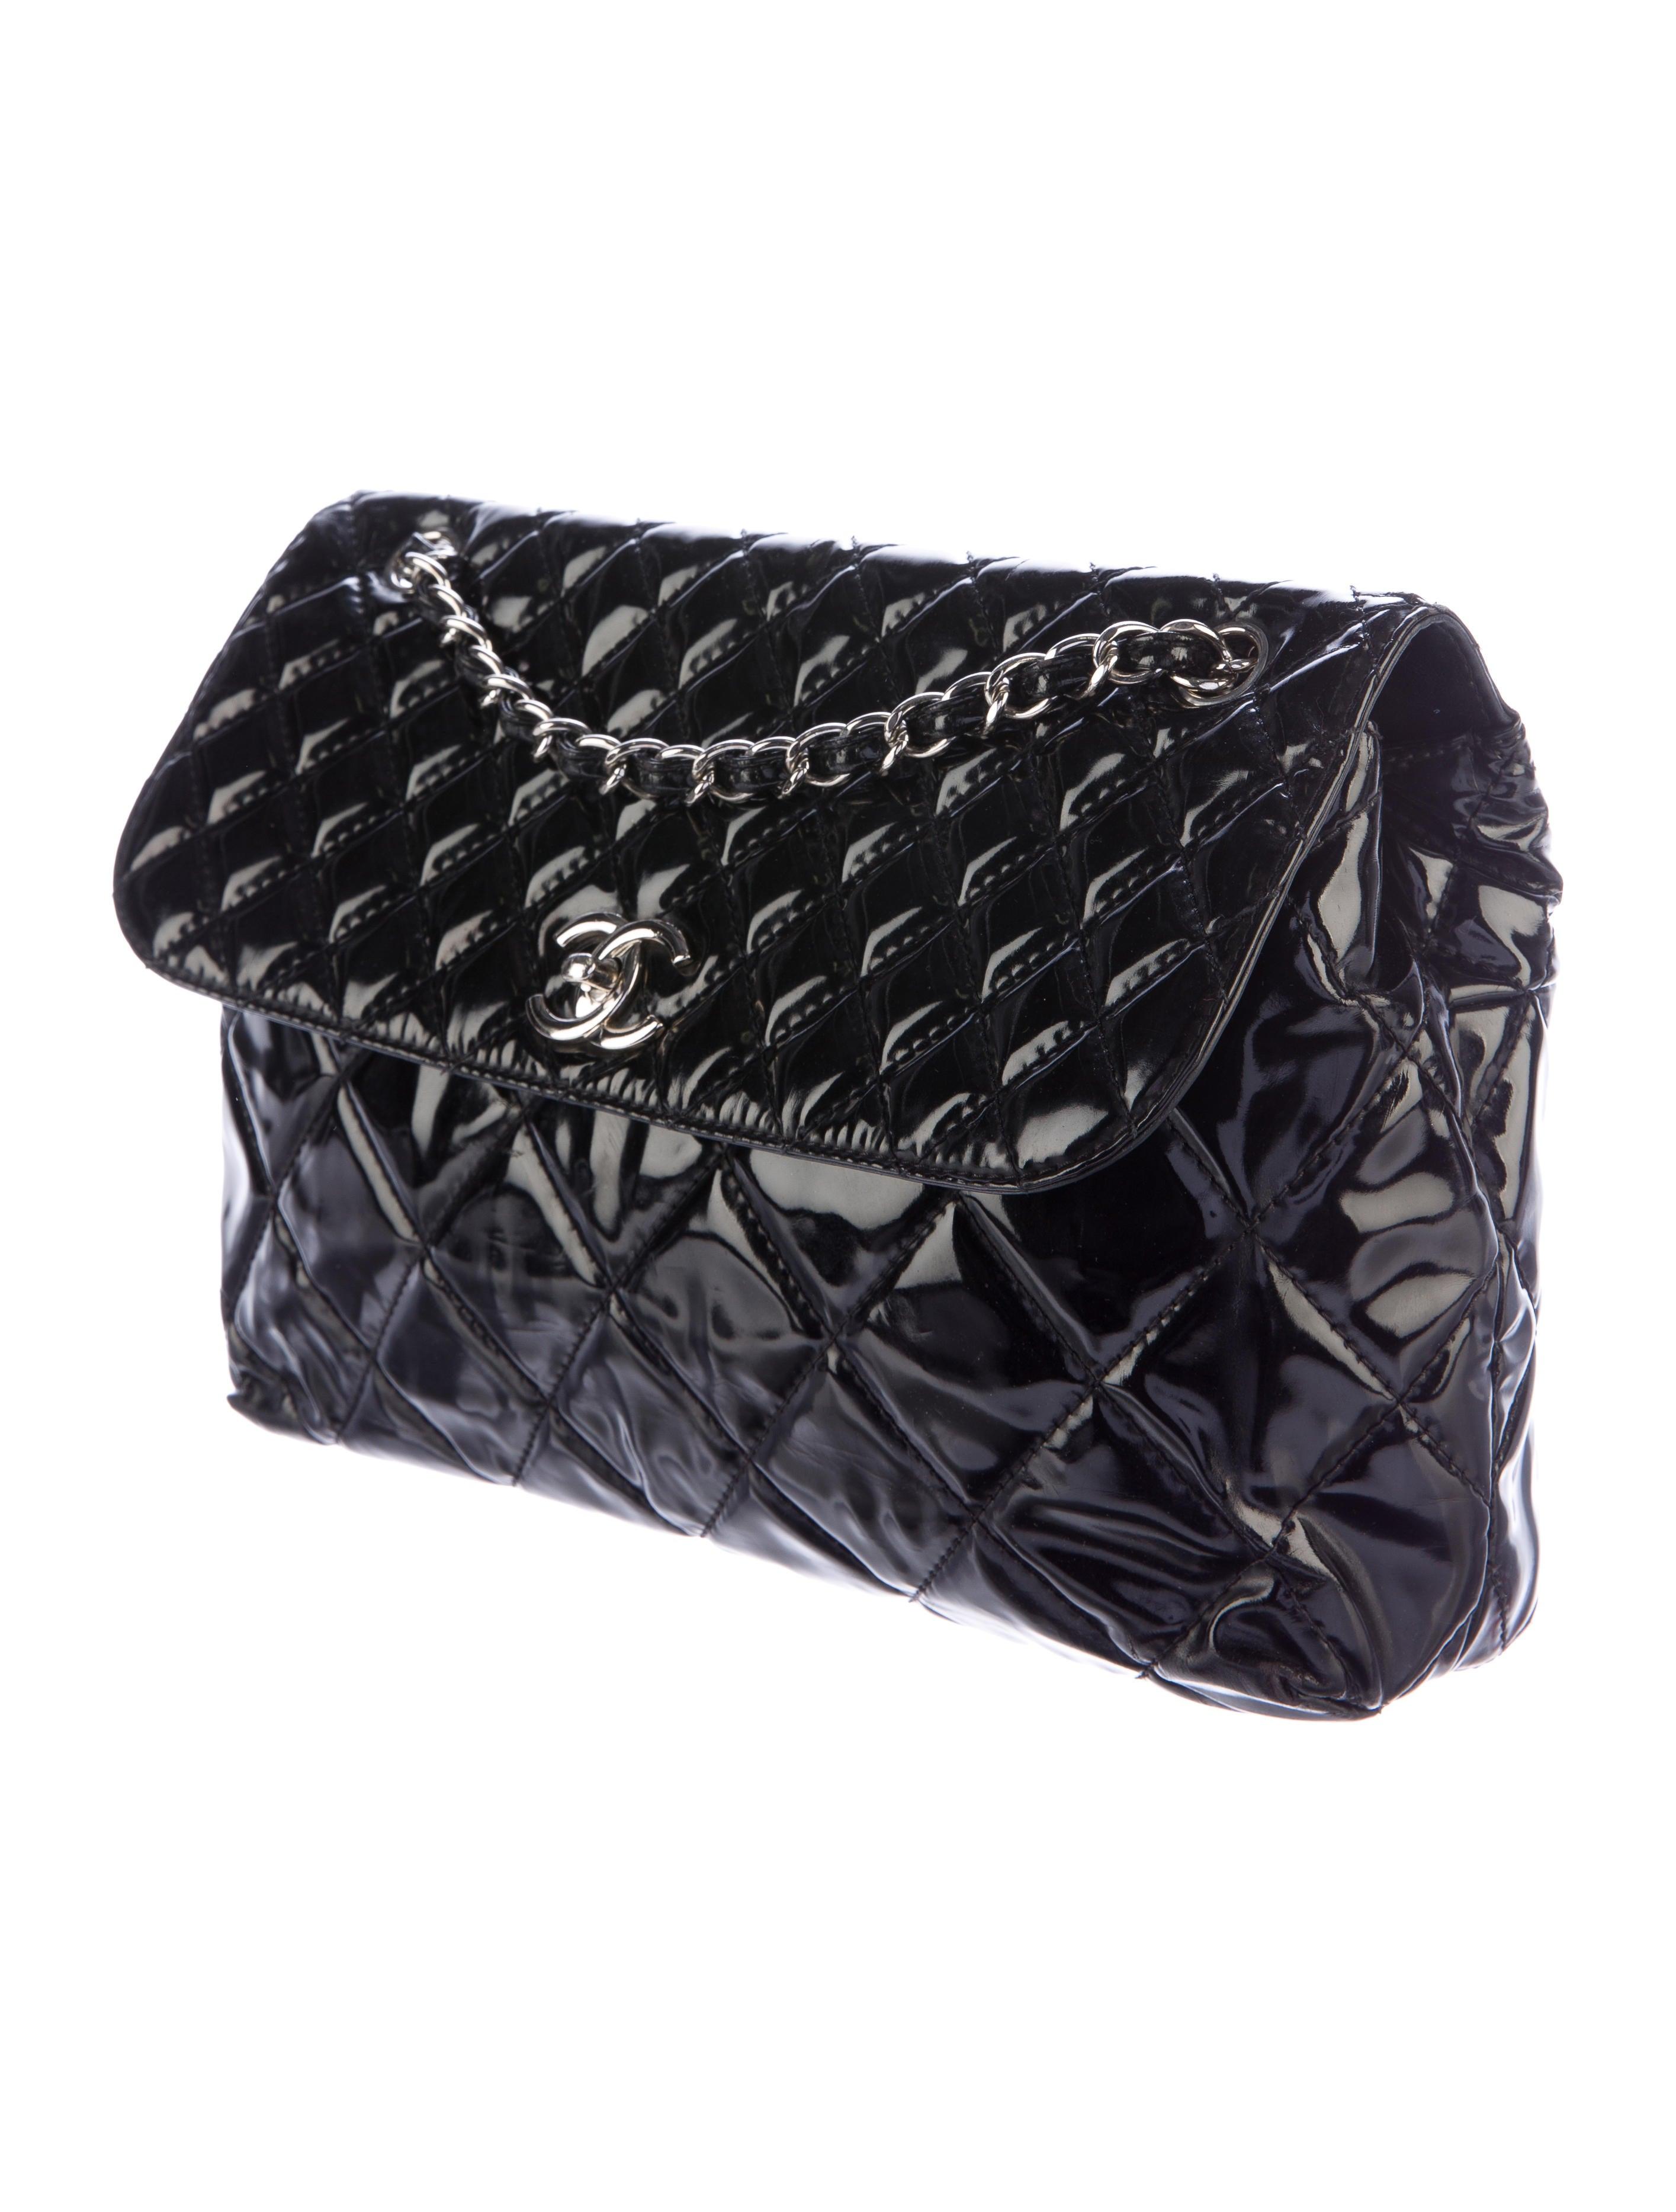 Chanel Vinyl In The Business Flap Bag Handbags